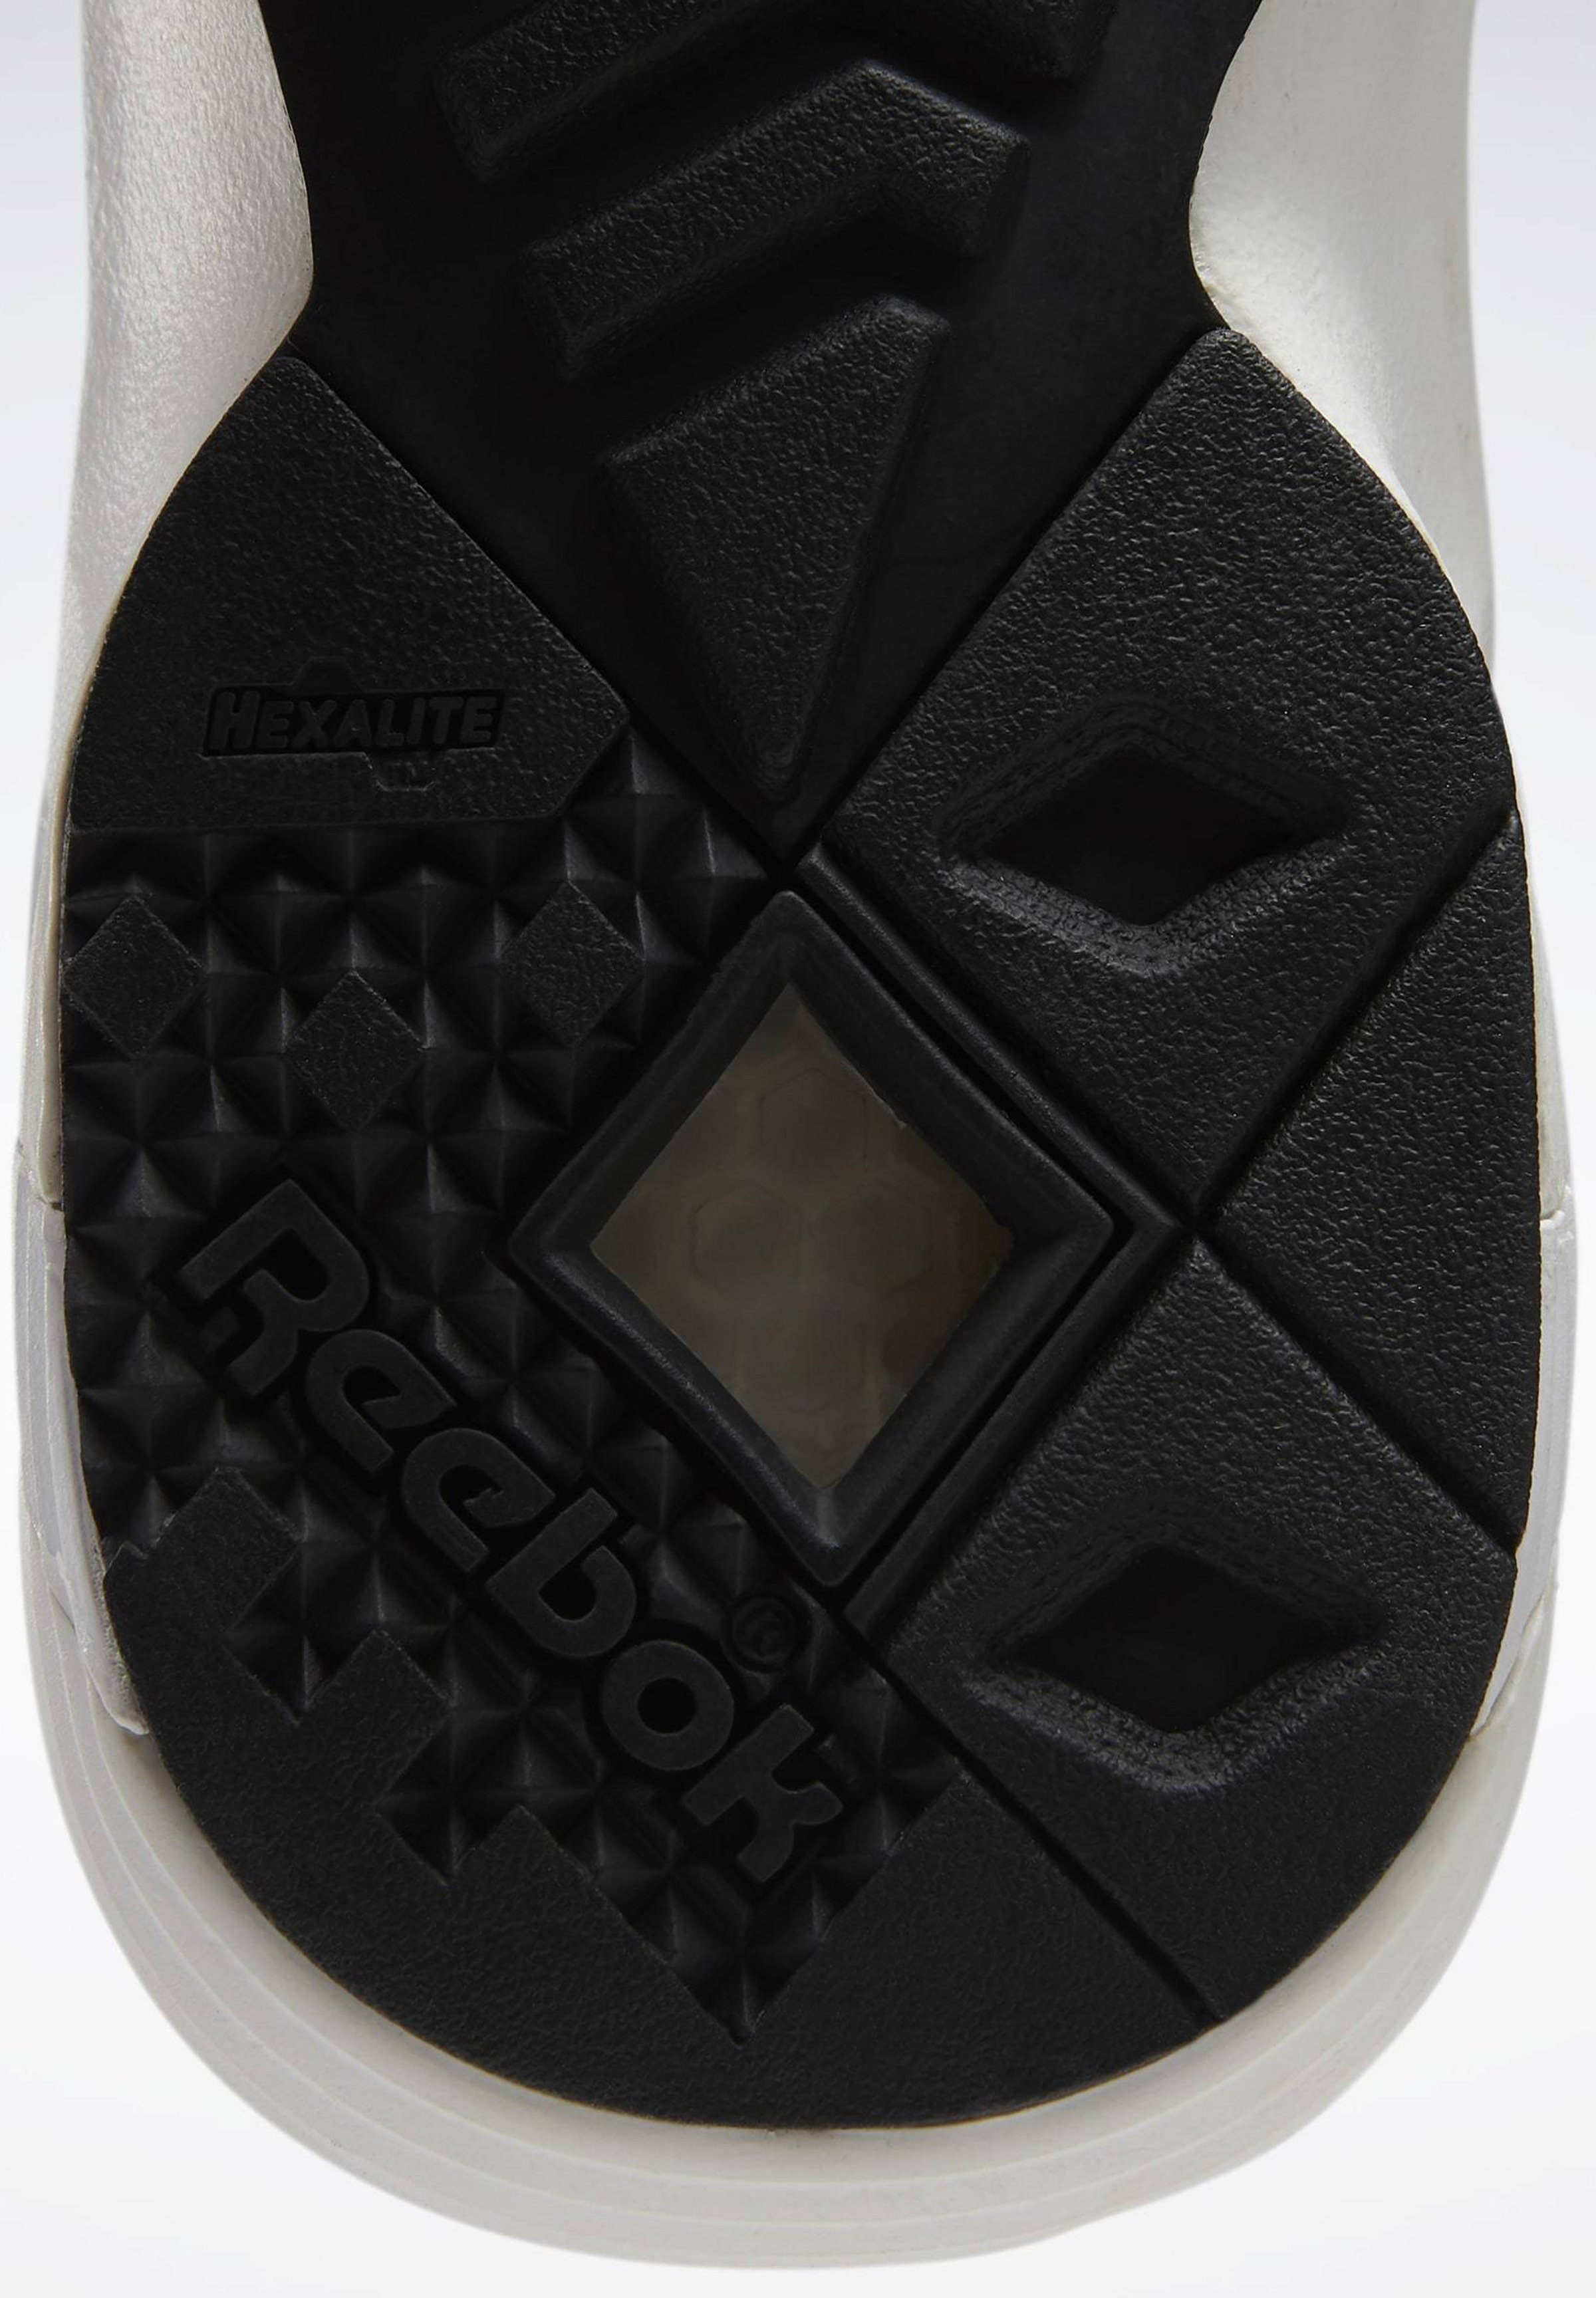 Reebok Classic Aztrek Double Mix Shoes - Sneaker Low Black Friday